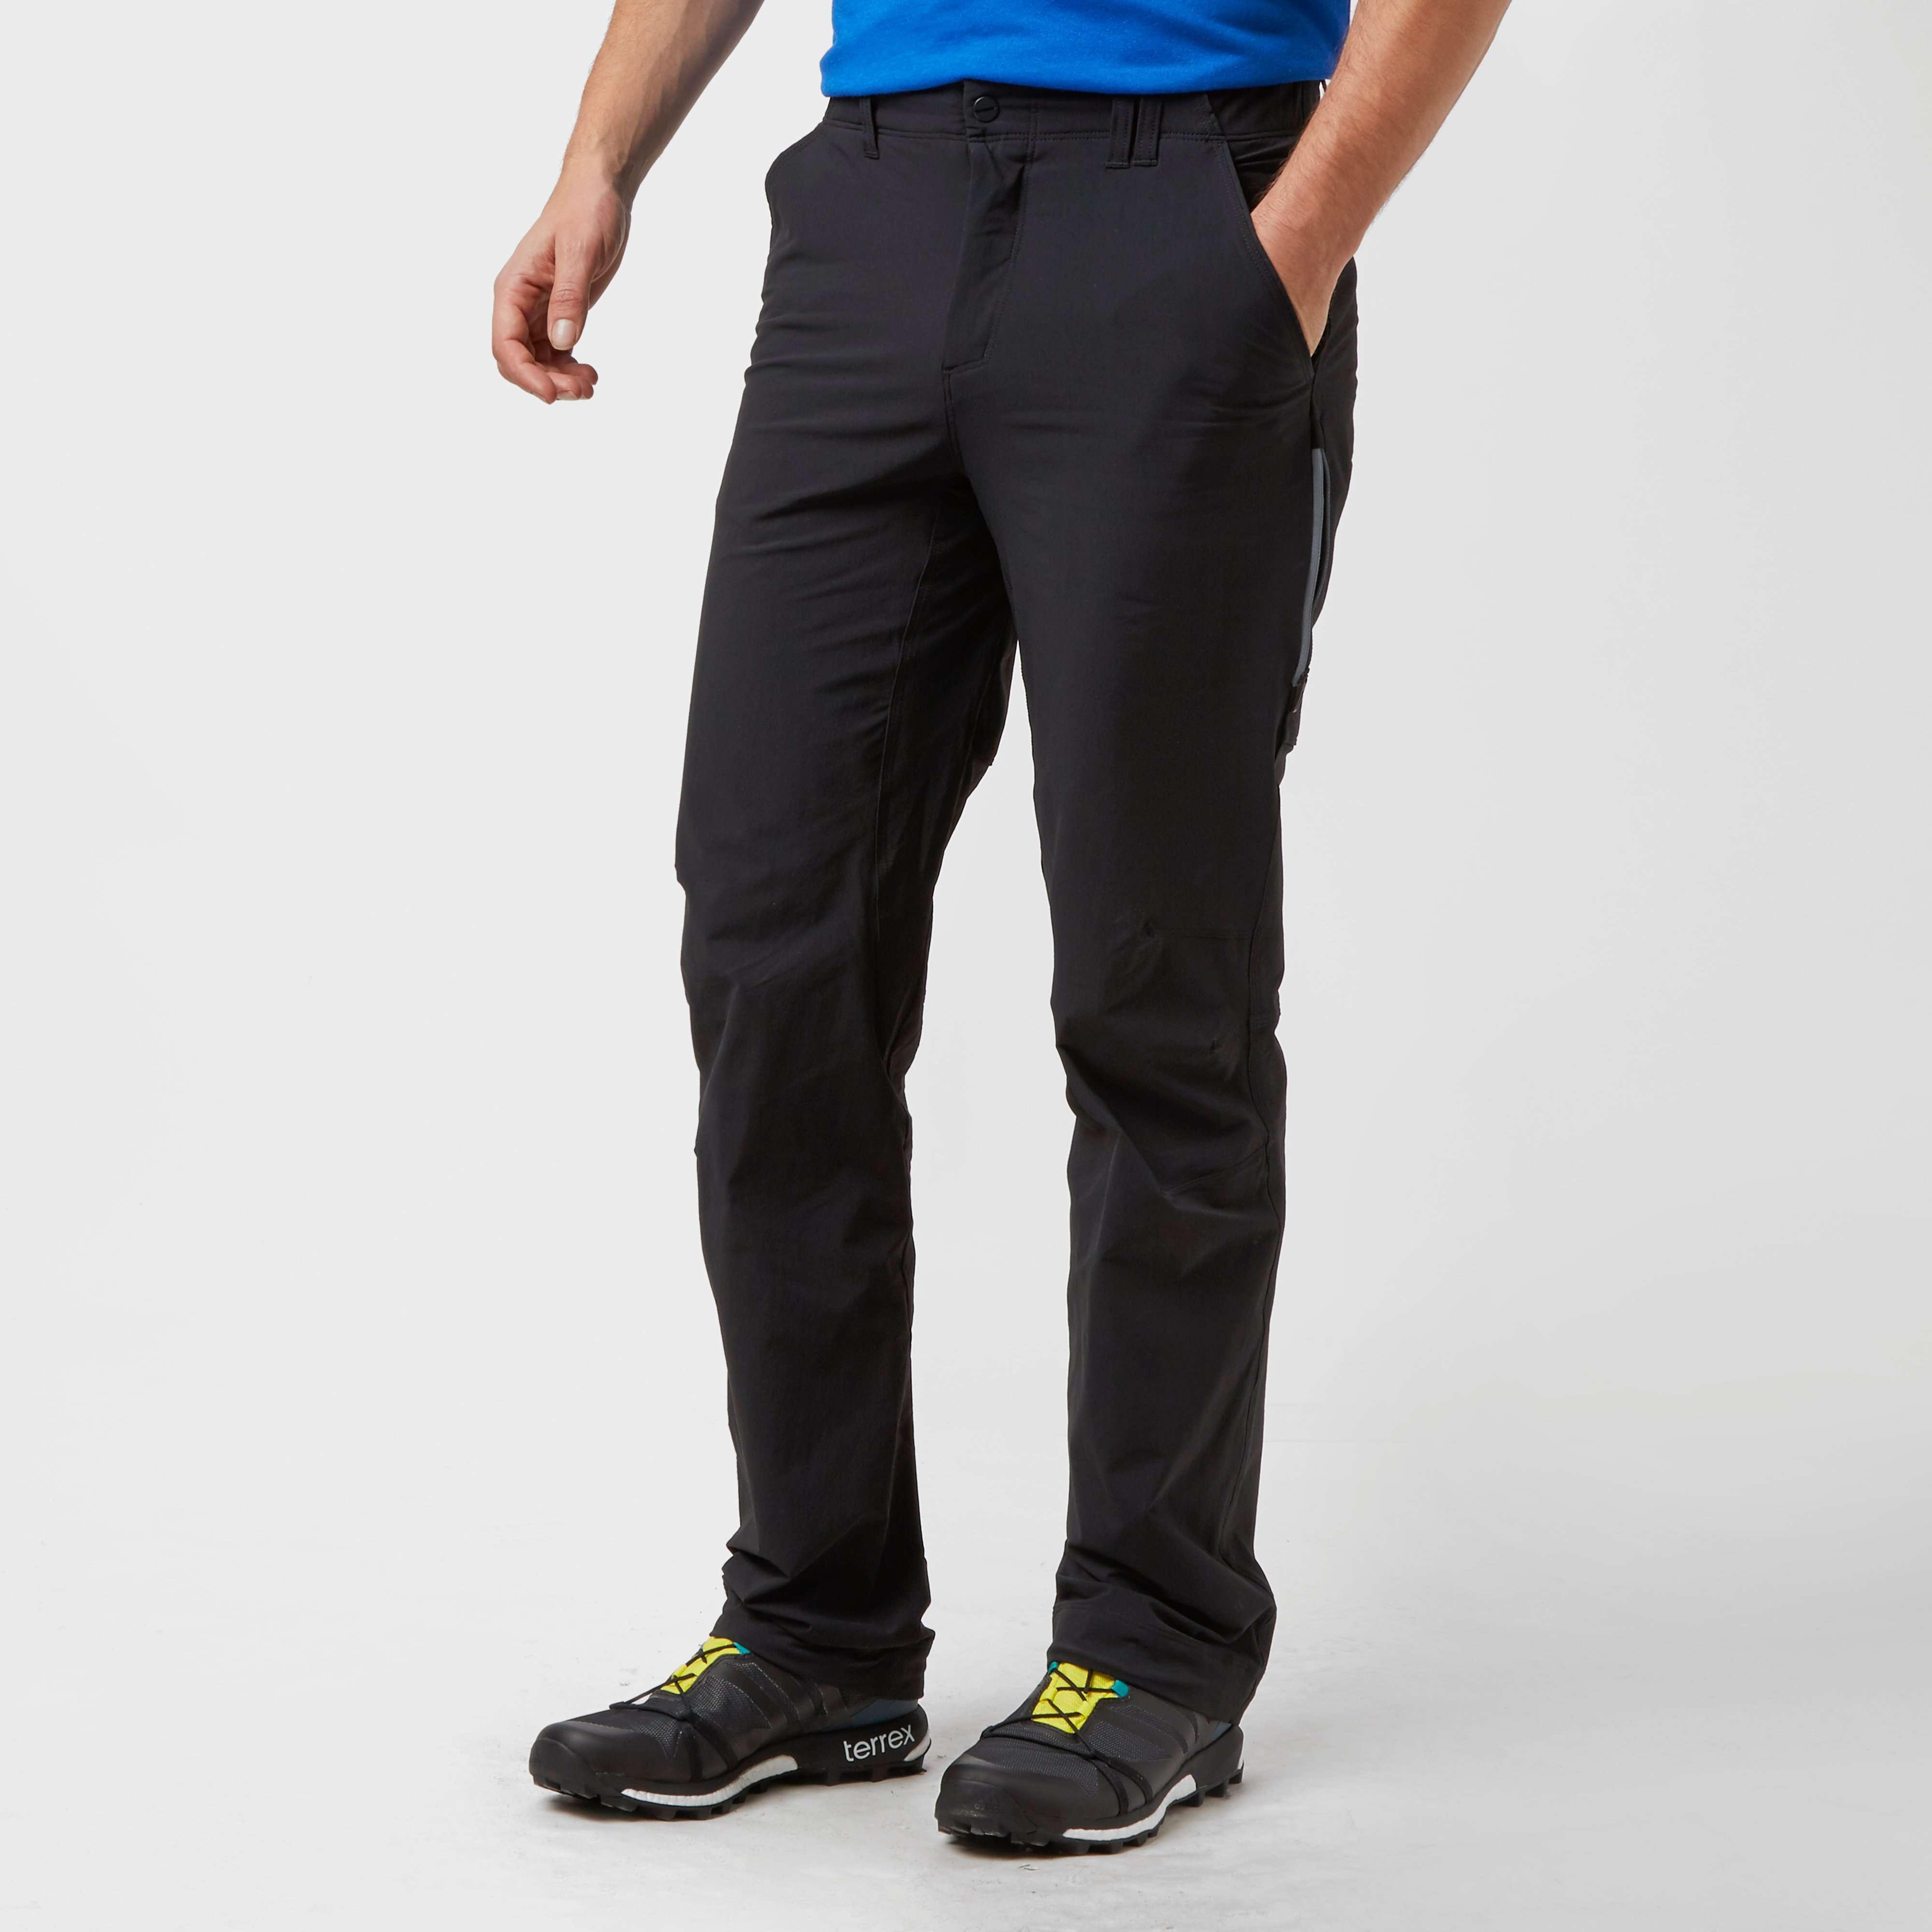 ADIDAS Men's Flex Mountain Pants